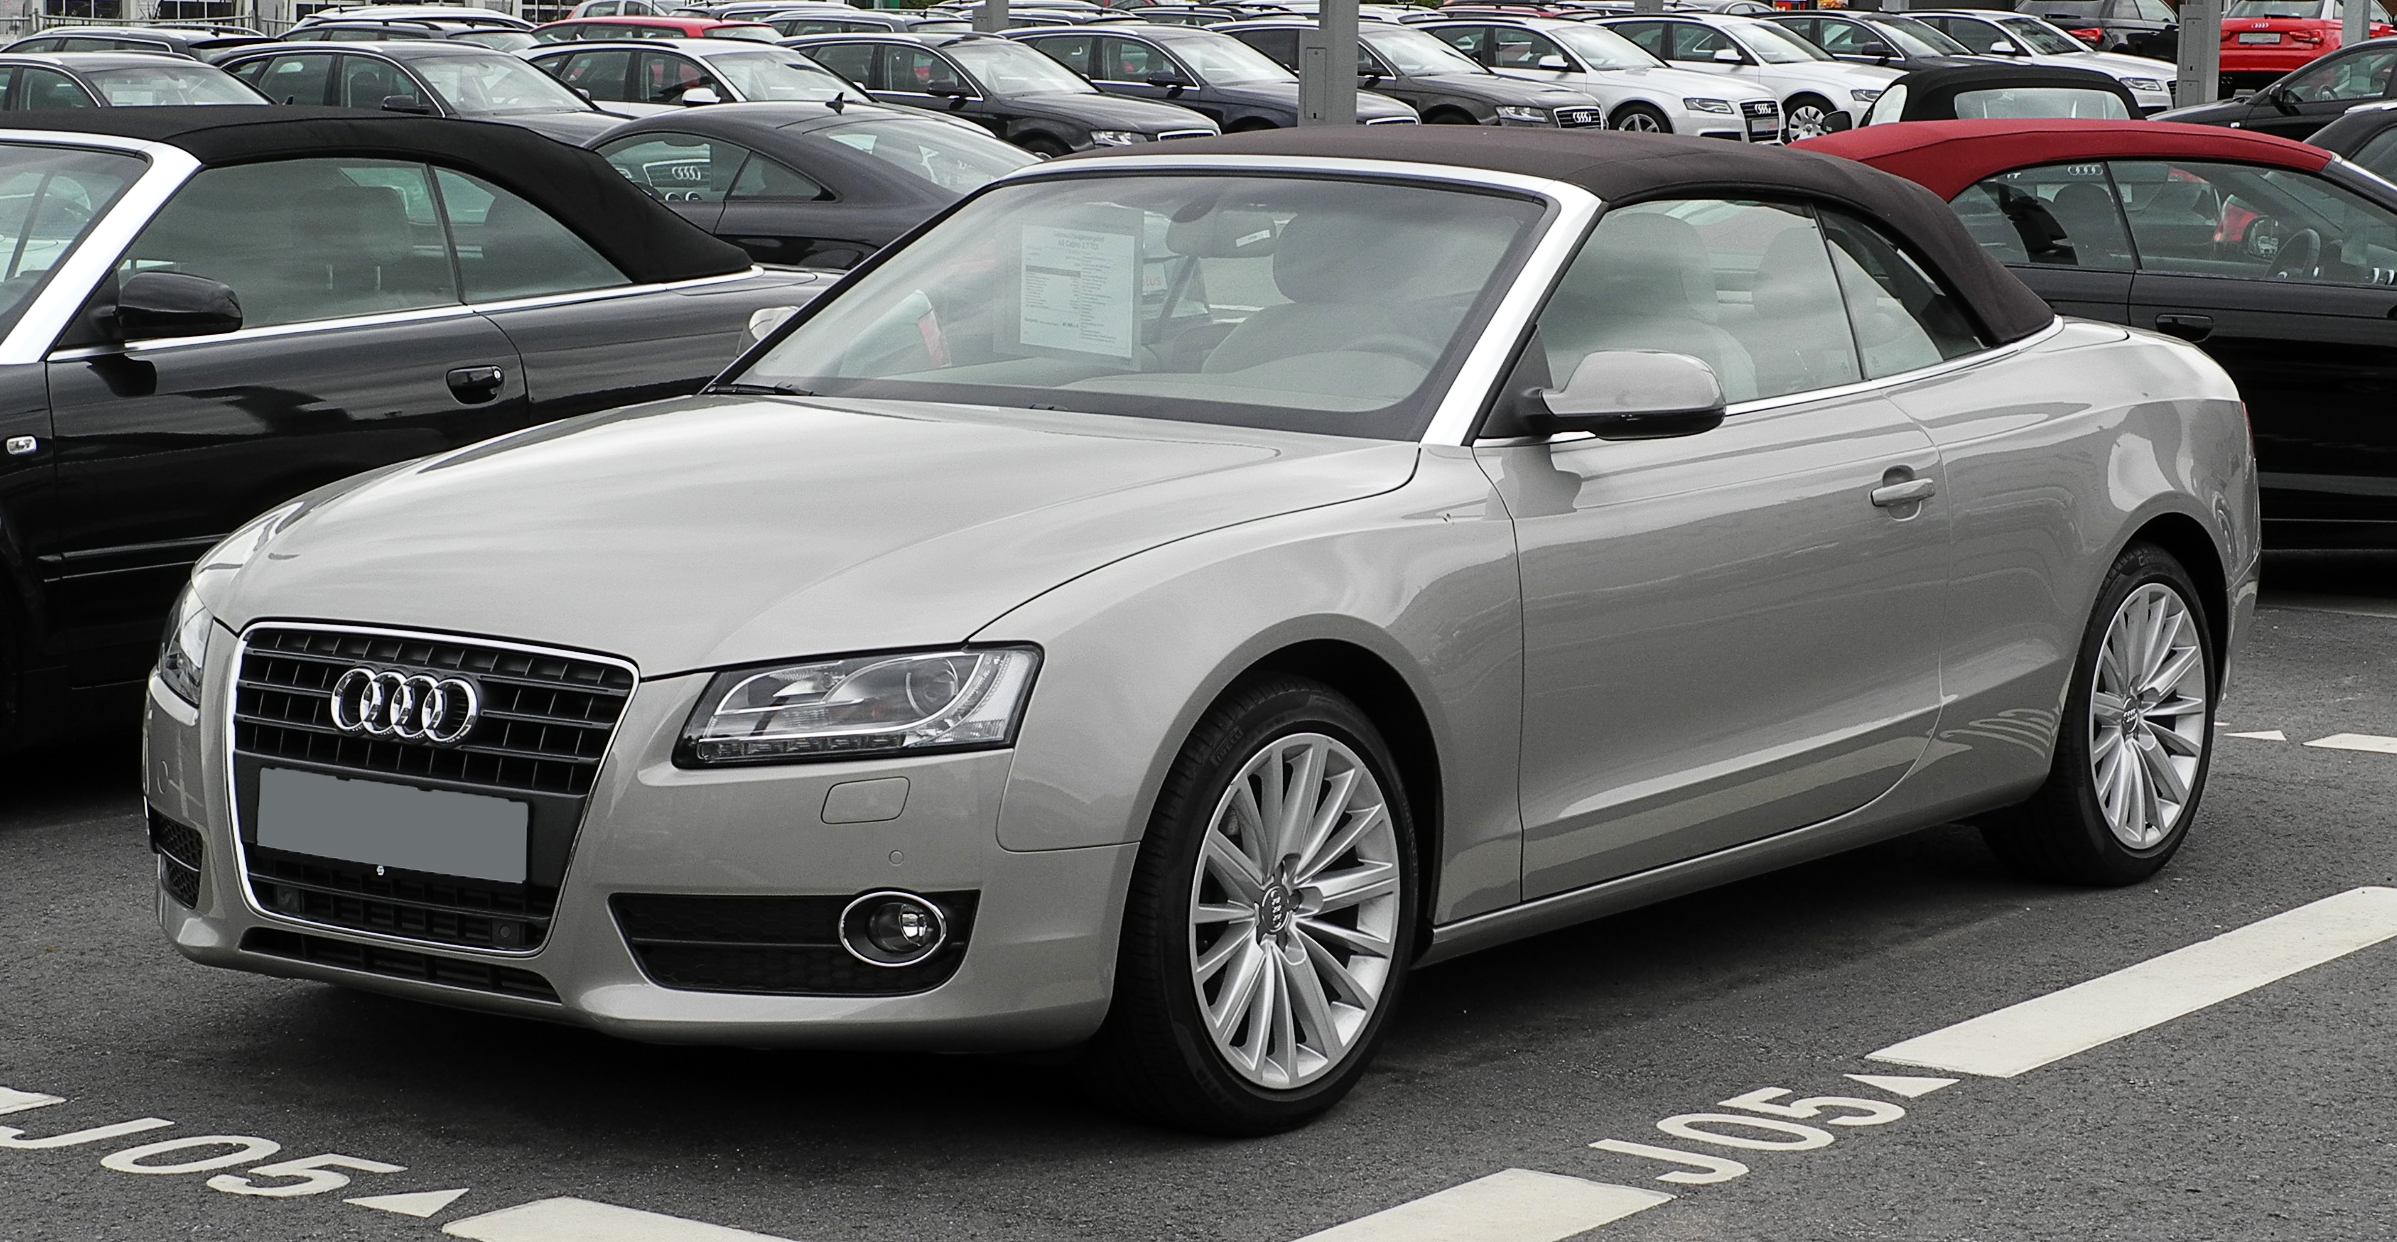 File Audi A5 Cabriolet 2 7 Tdi Frontansicht 13 Juni